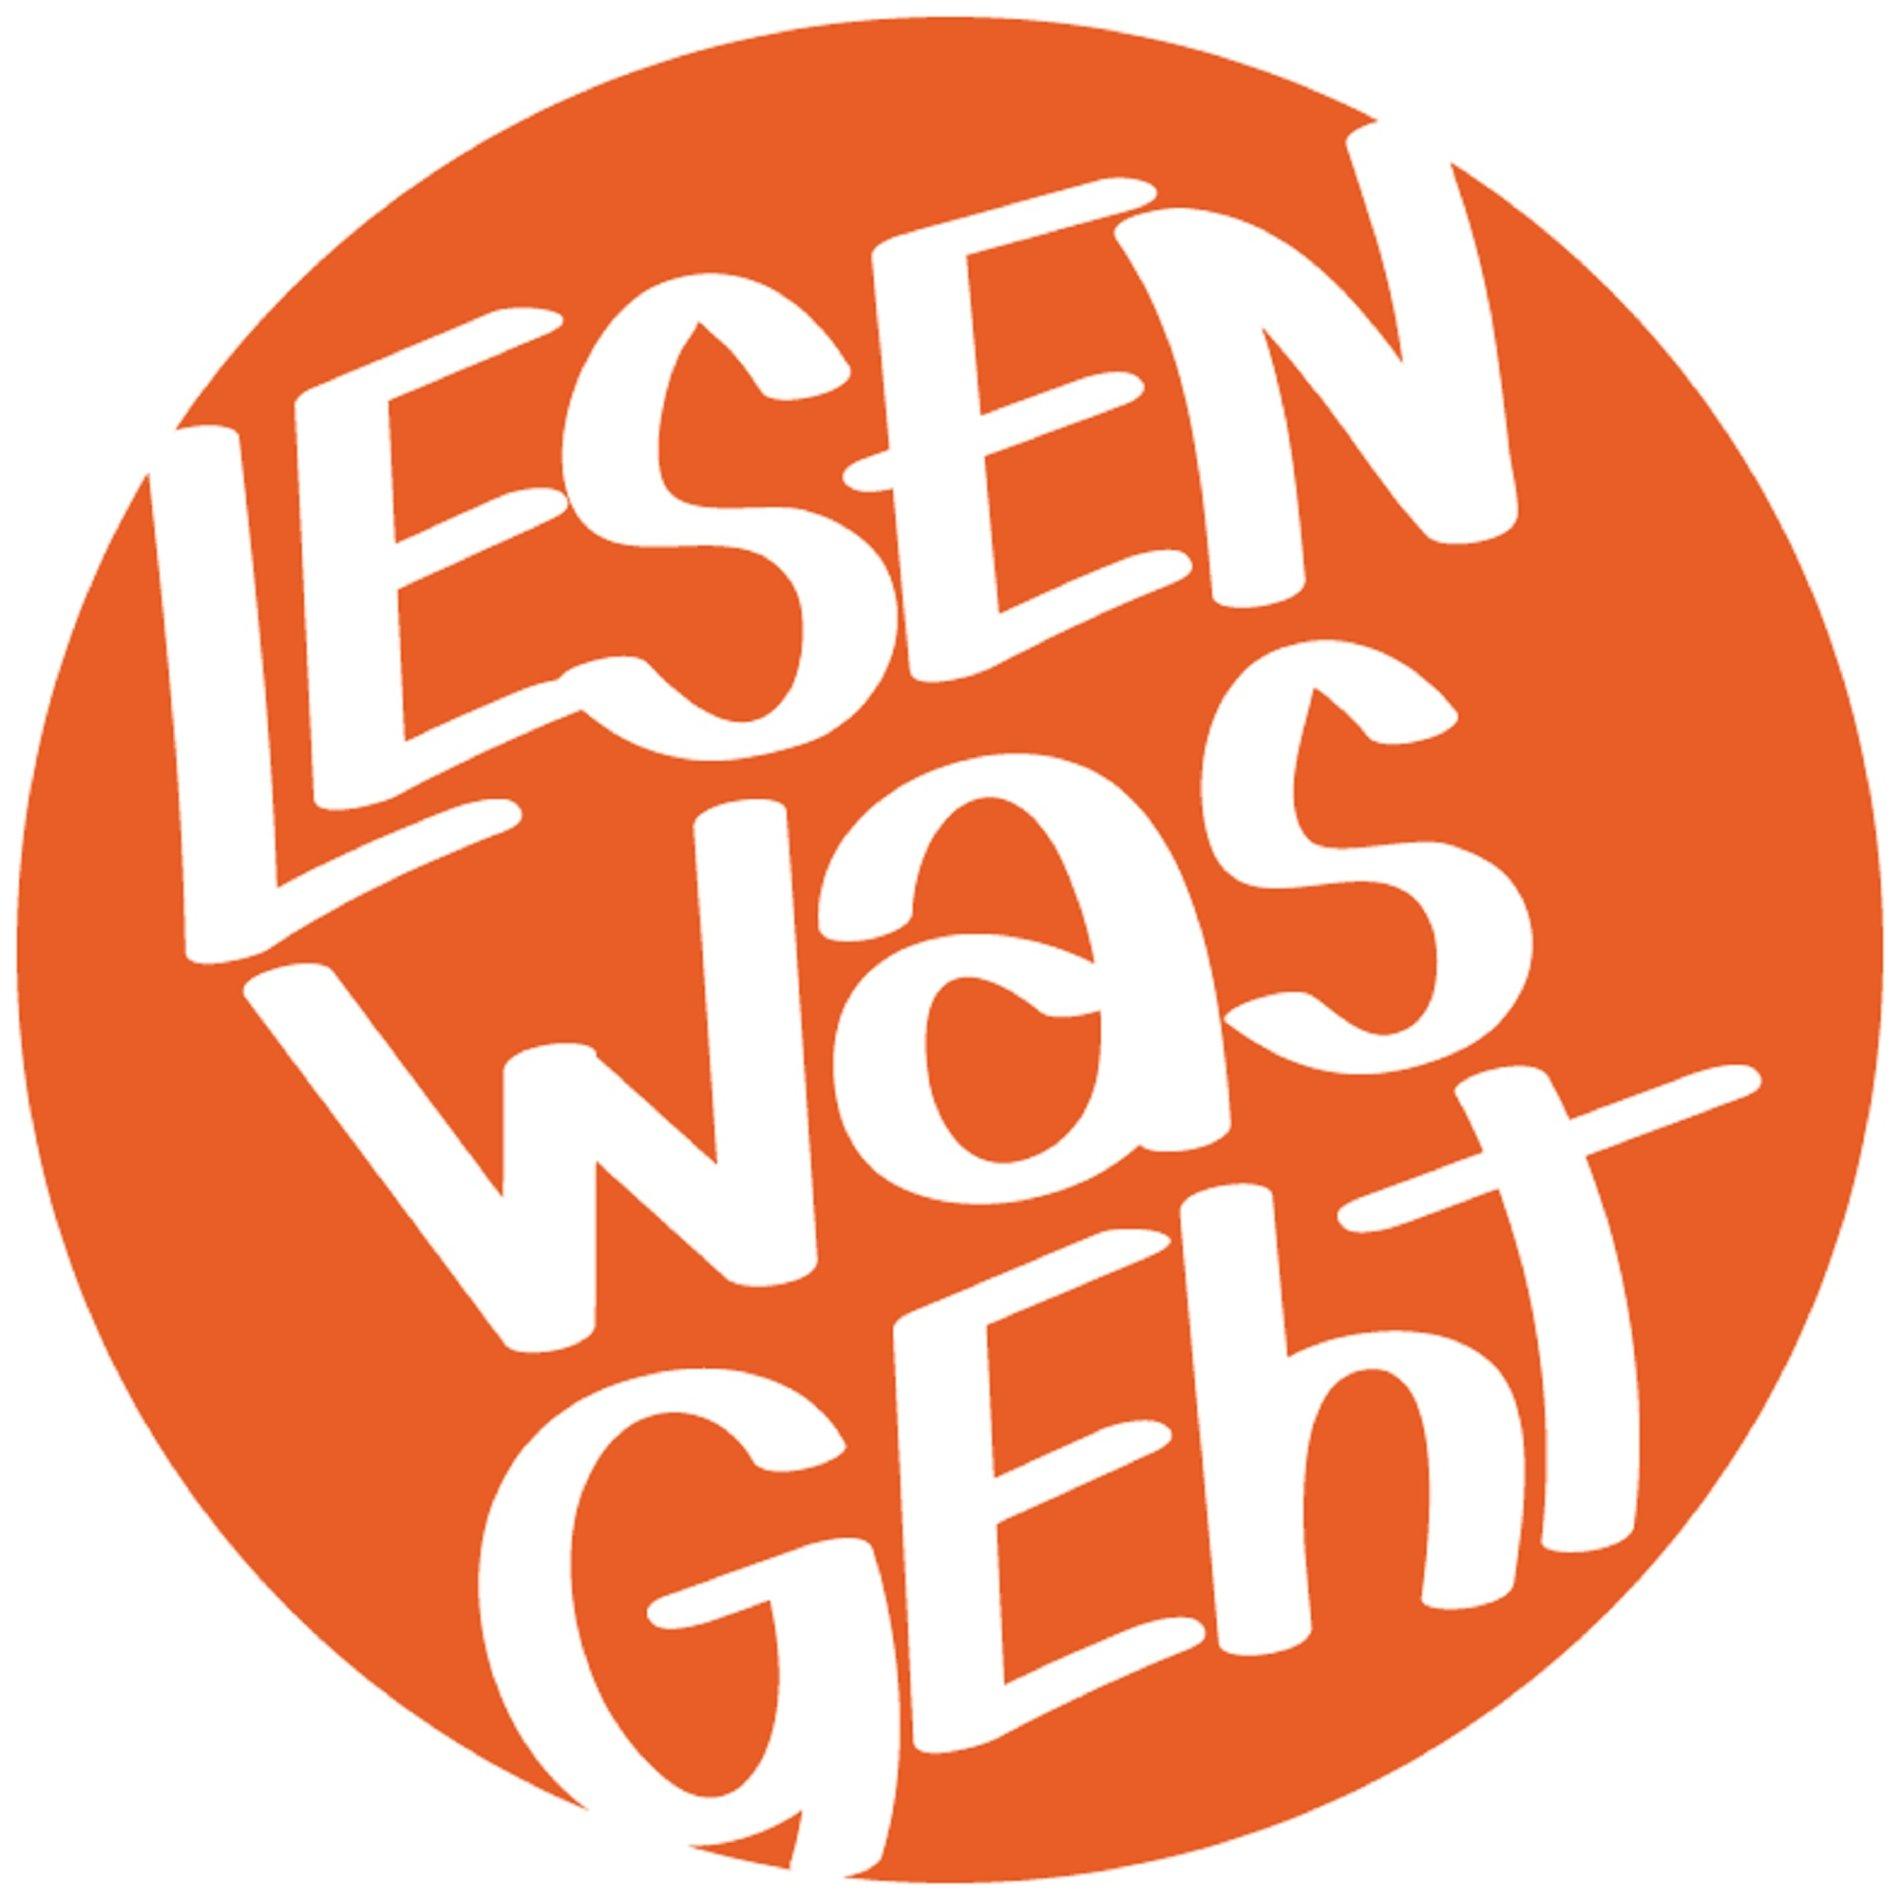 Sommerferien - Leseclub Neufahrn